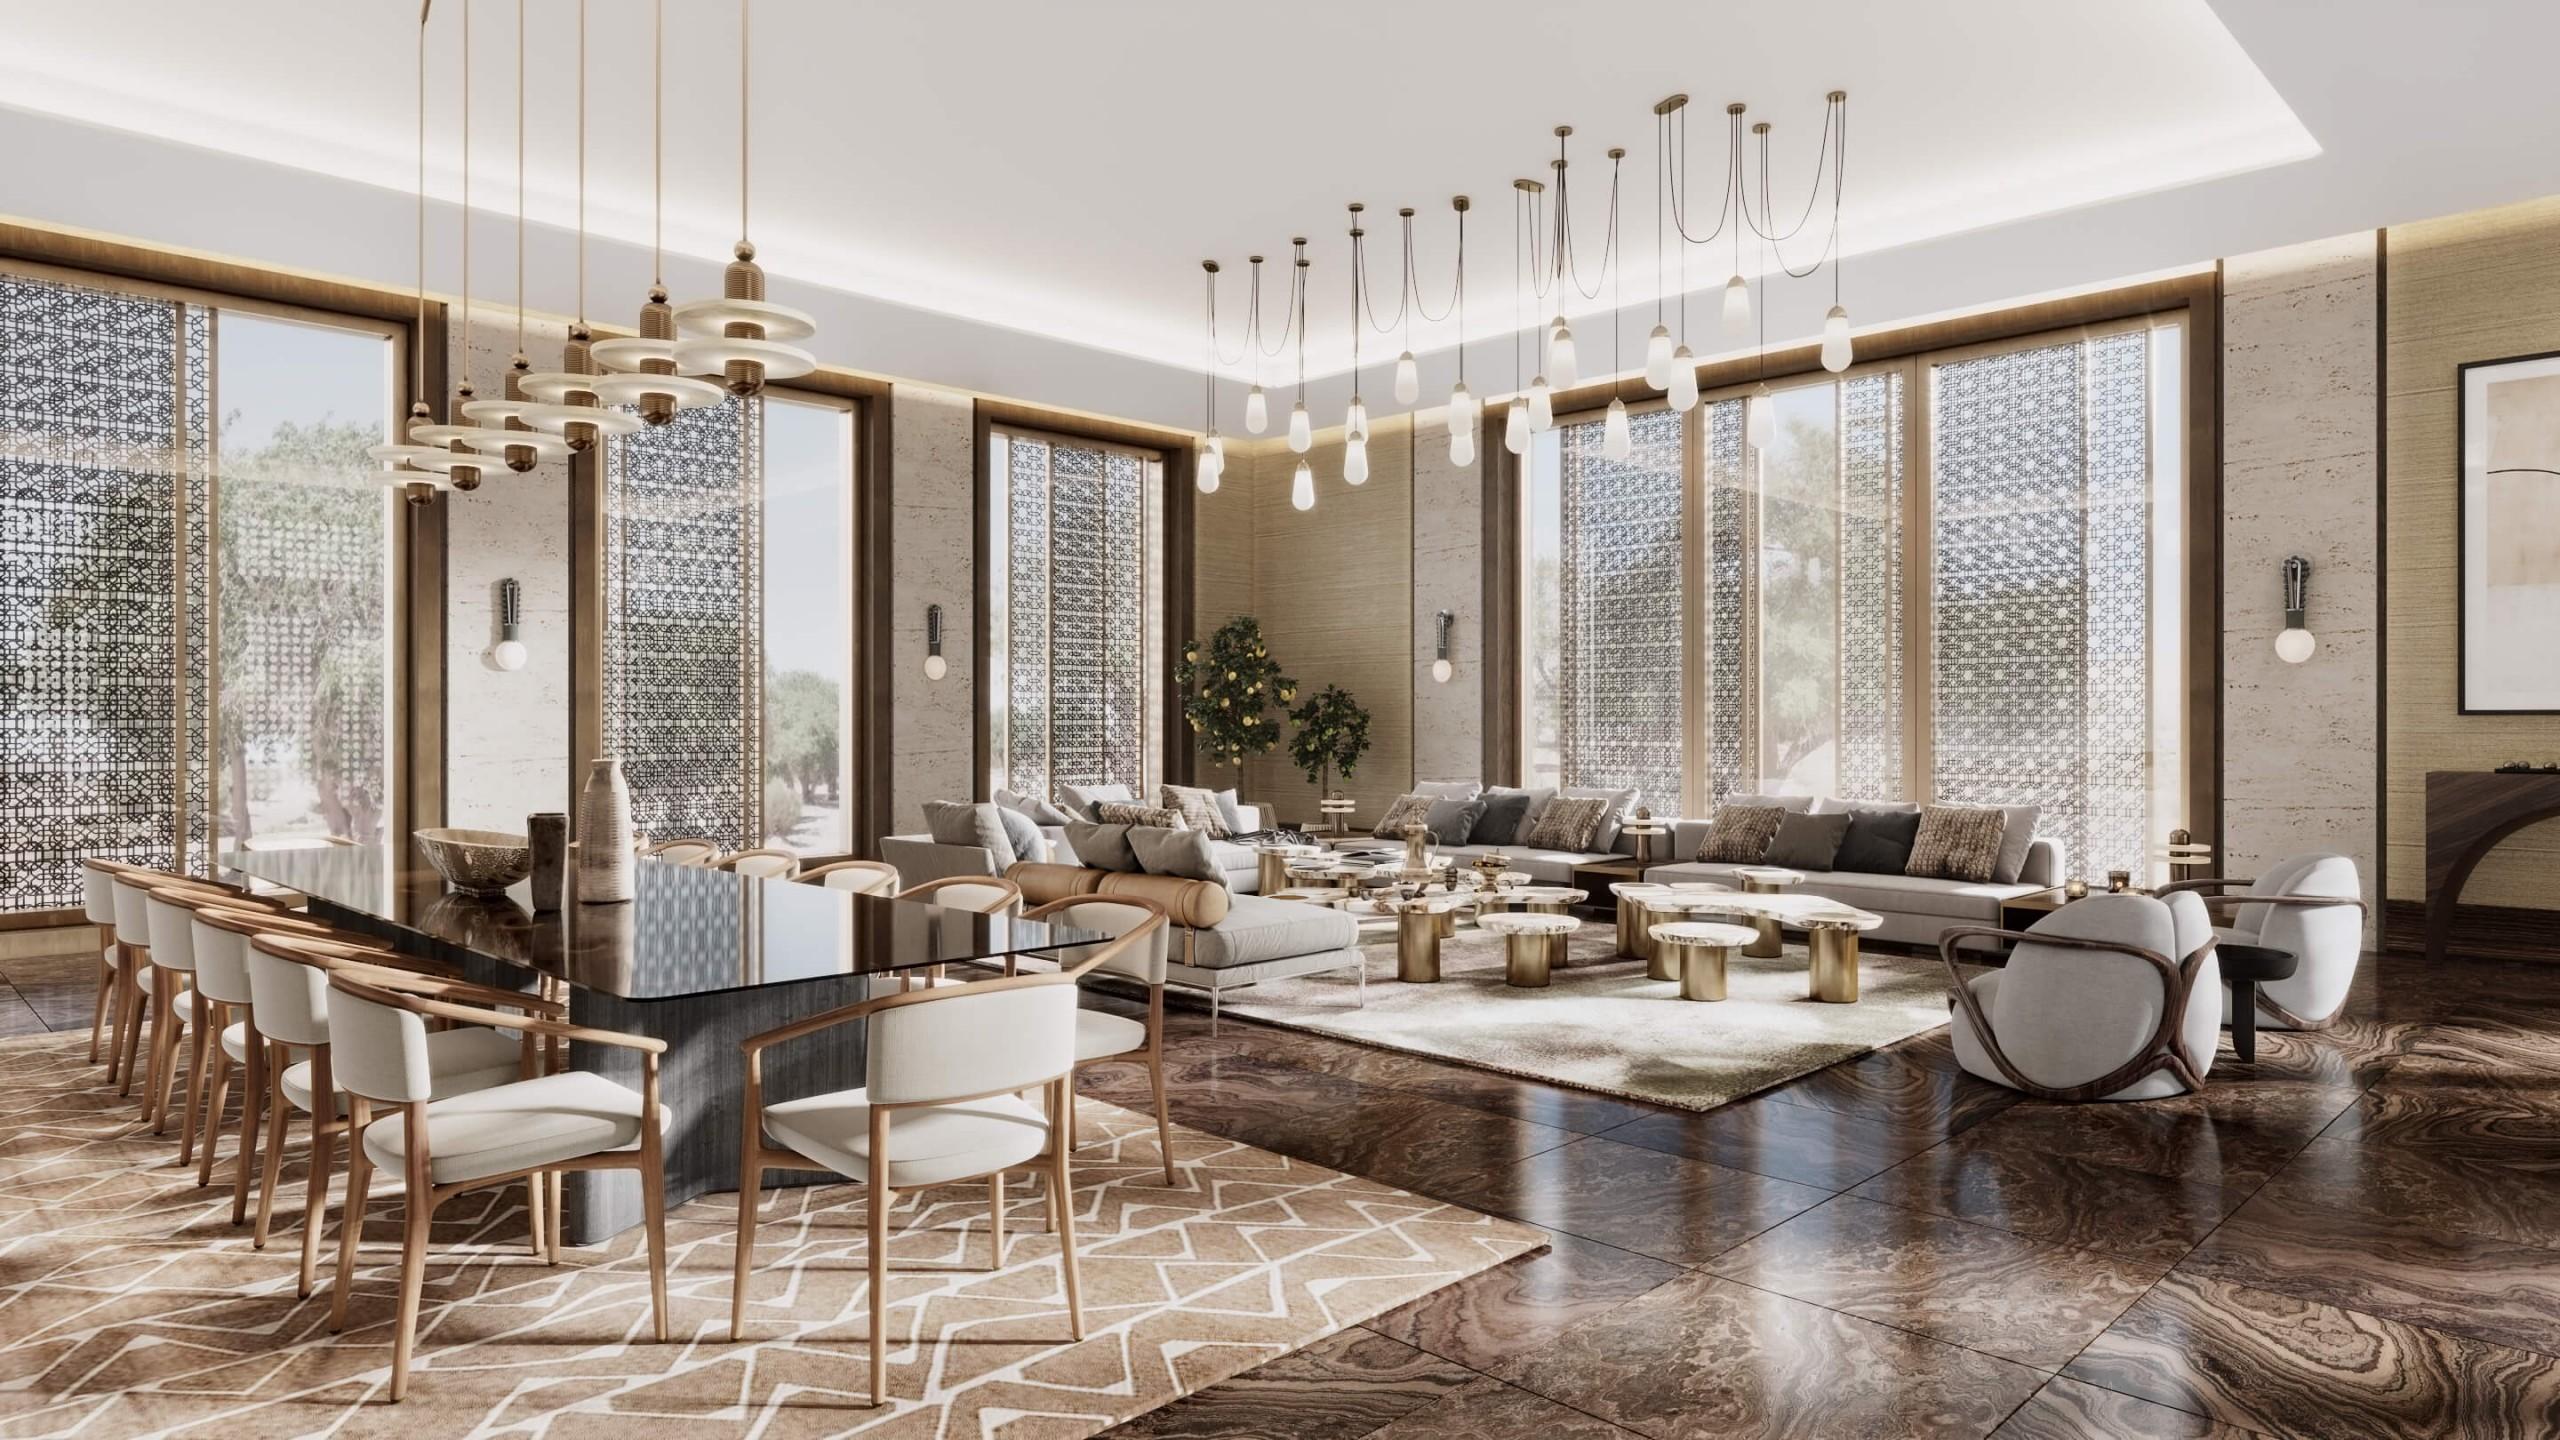 Croatia Luxury Rent, The Best Luxury Villa Rental in Croatia